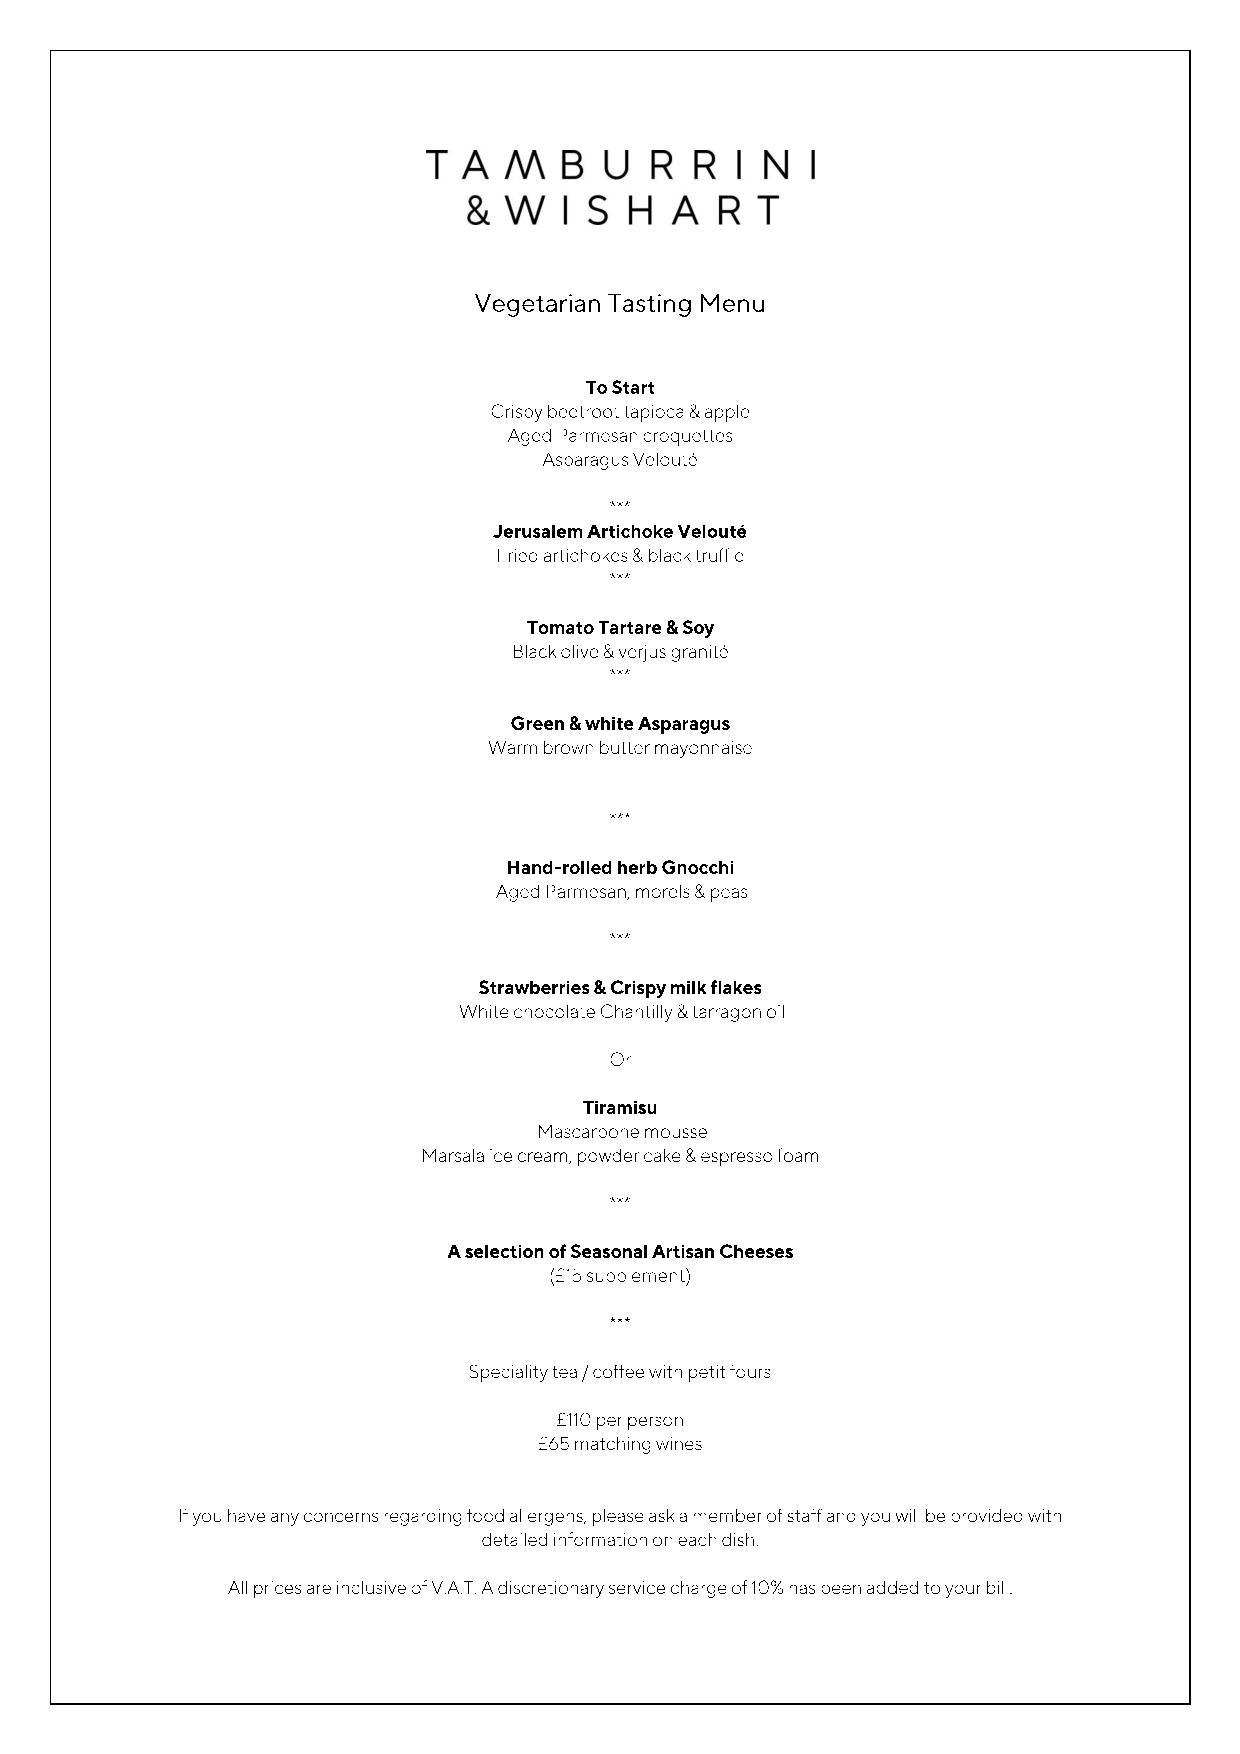 Tamburrini and Wishart vegetarian menu